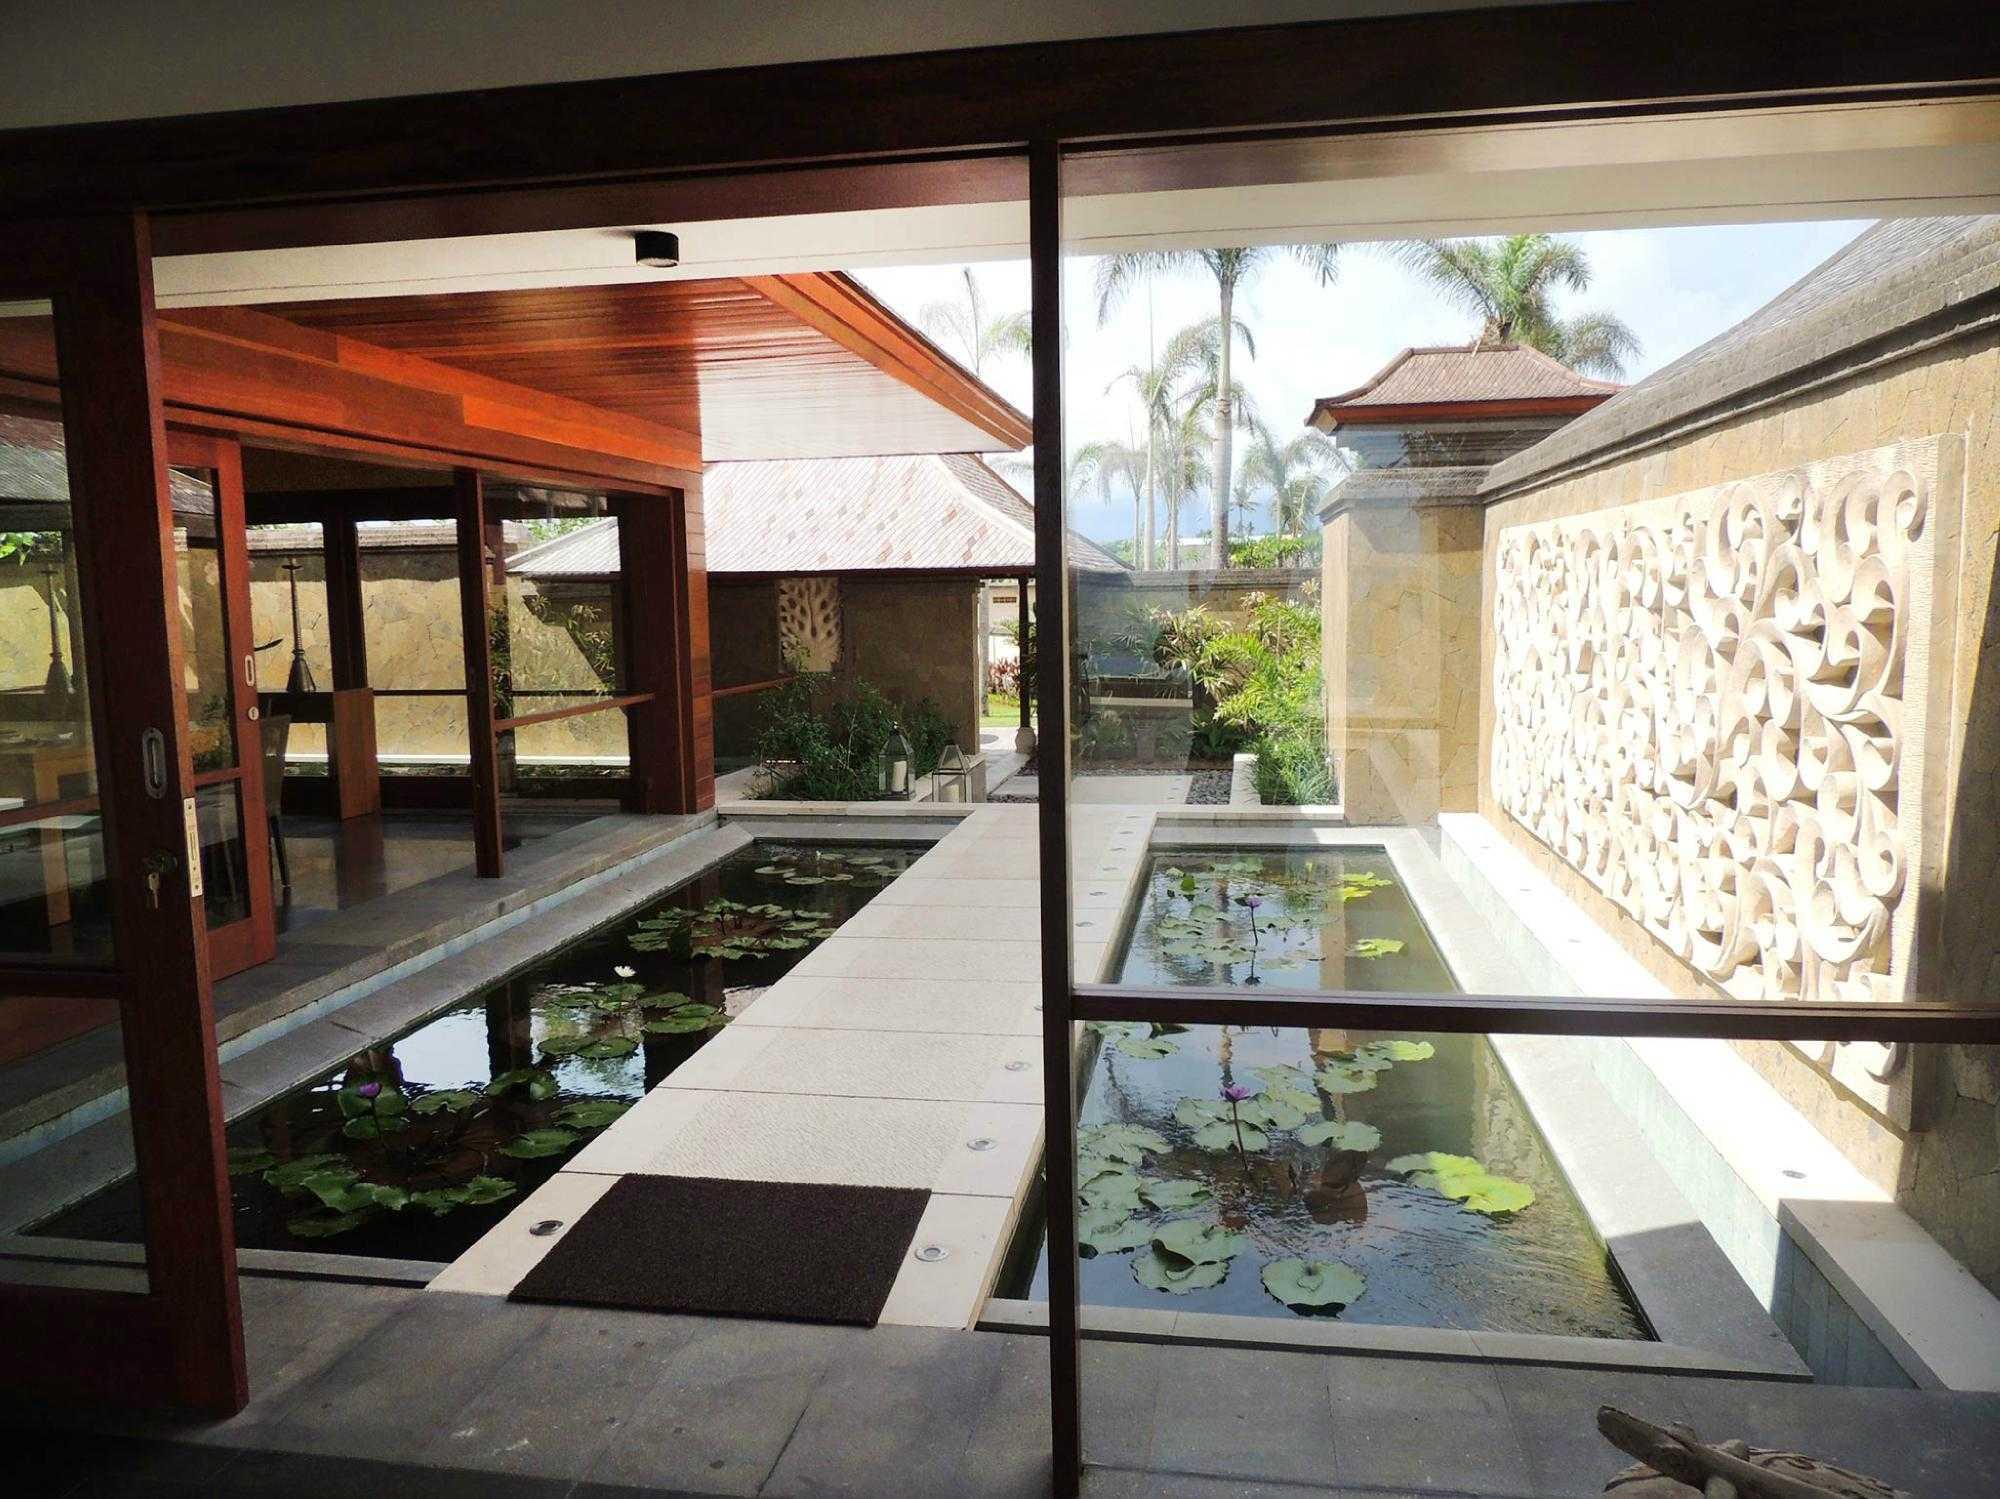 Agung Budi Raharsa | Architecture & Engineering Bayu Gita Villa - Bali Bali, Indonesia Bali, Indonesia Agung-Budi-Raharsa-Bayu-Gita-Villa-By-Agung-Budi-Raharsa-With-Csa  88350